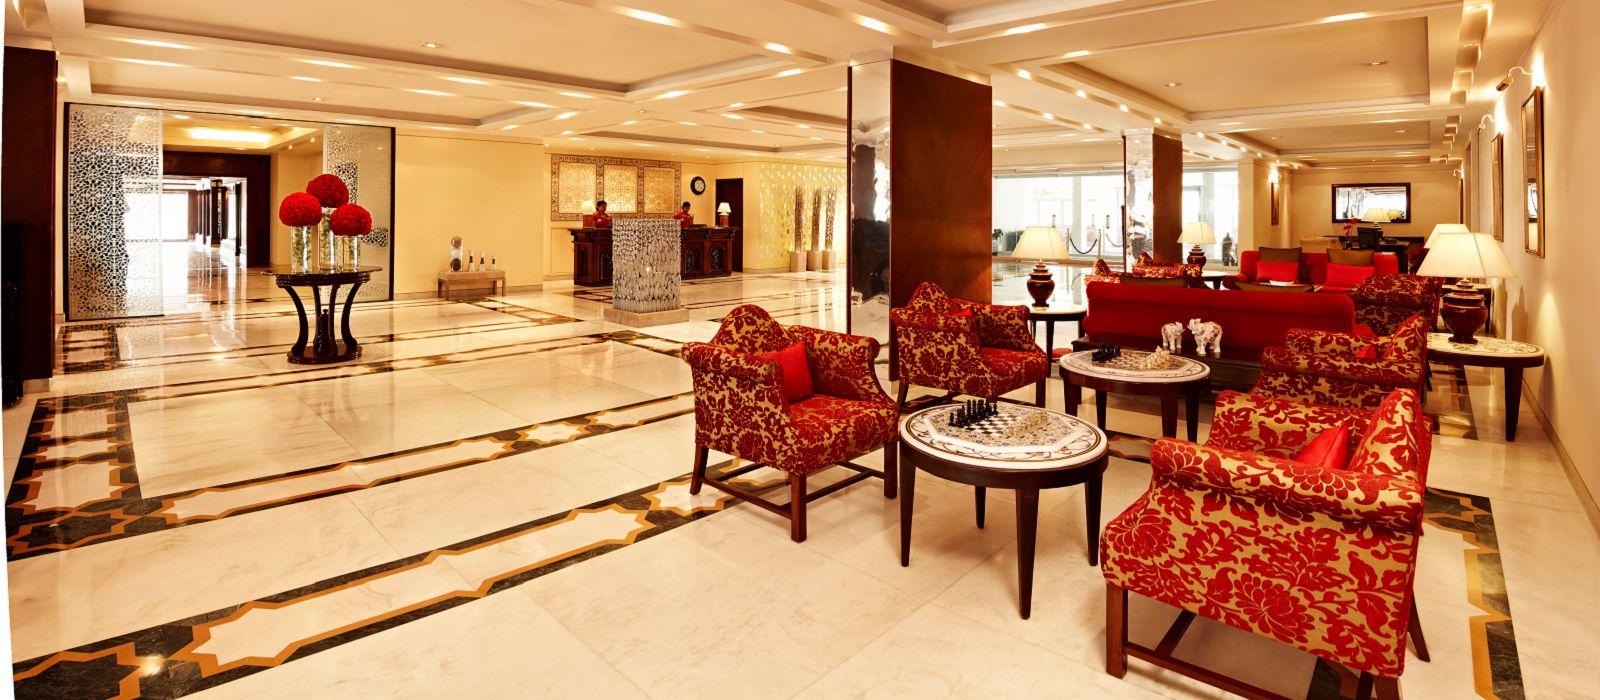 Hotel Taj View, Agra Nordindien